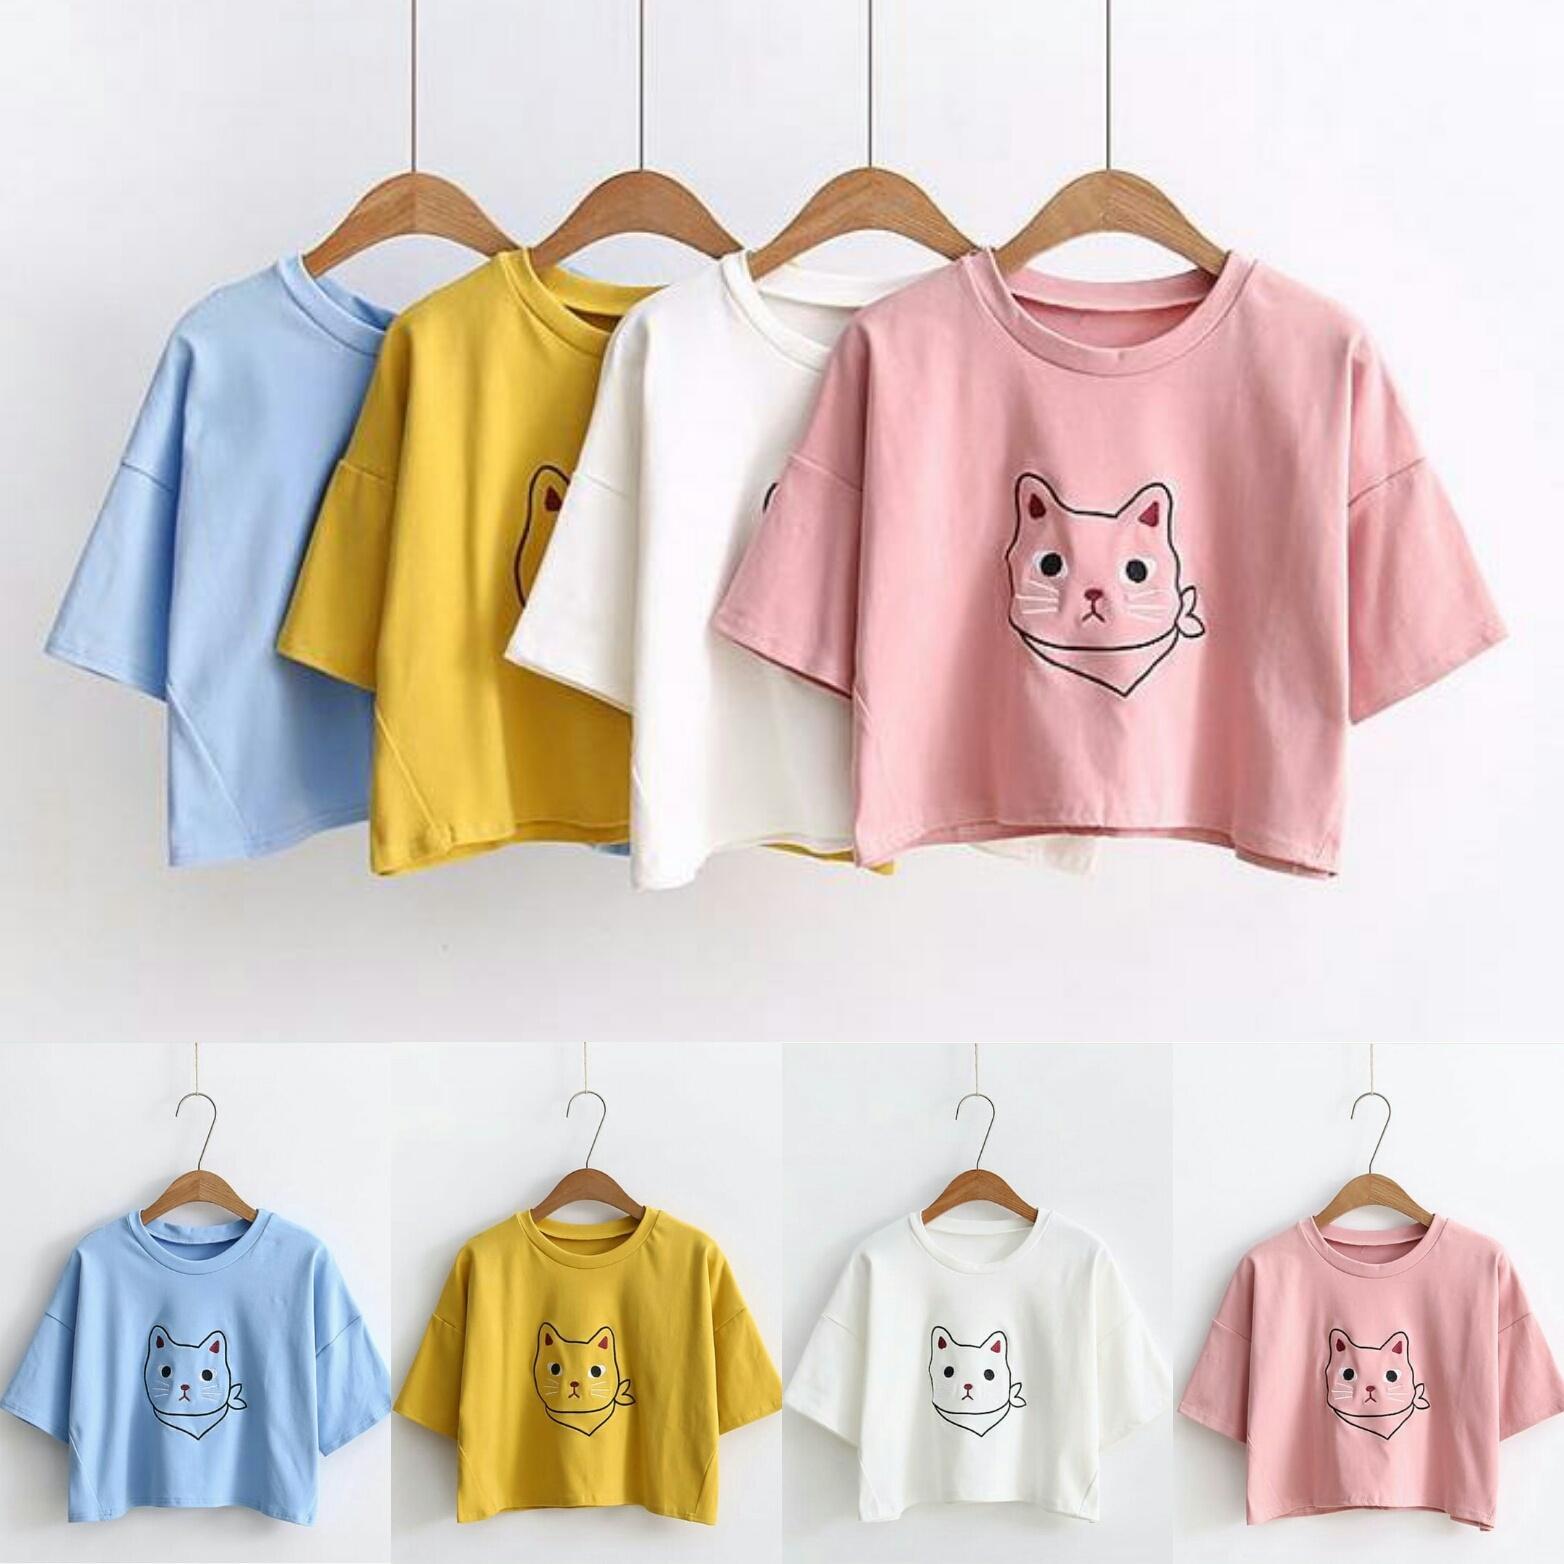 ... Fashion Terkini / Koleksi Kekinian / Kaos Wanita / Tshirt Spandek. IDR 25,999 IDR25999. View Detail. Baju Bagus SFS Cat Crop Tee sf